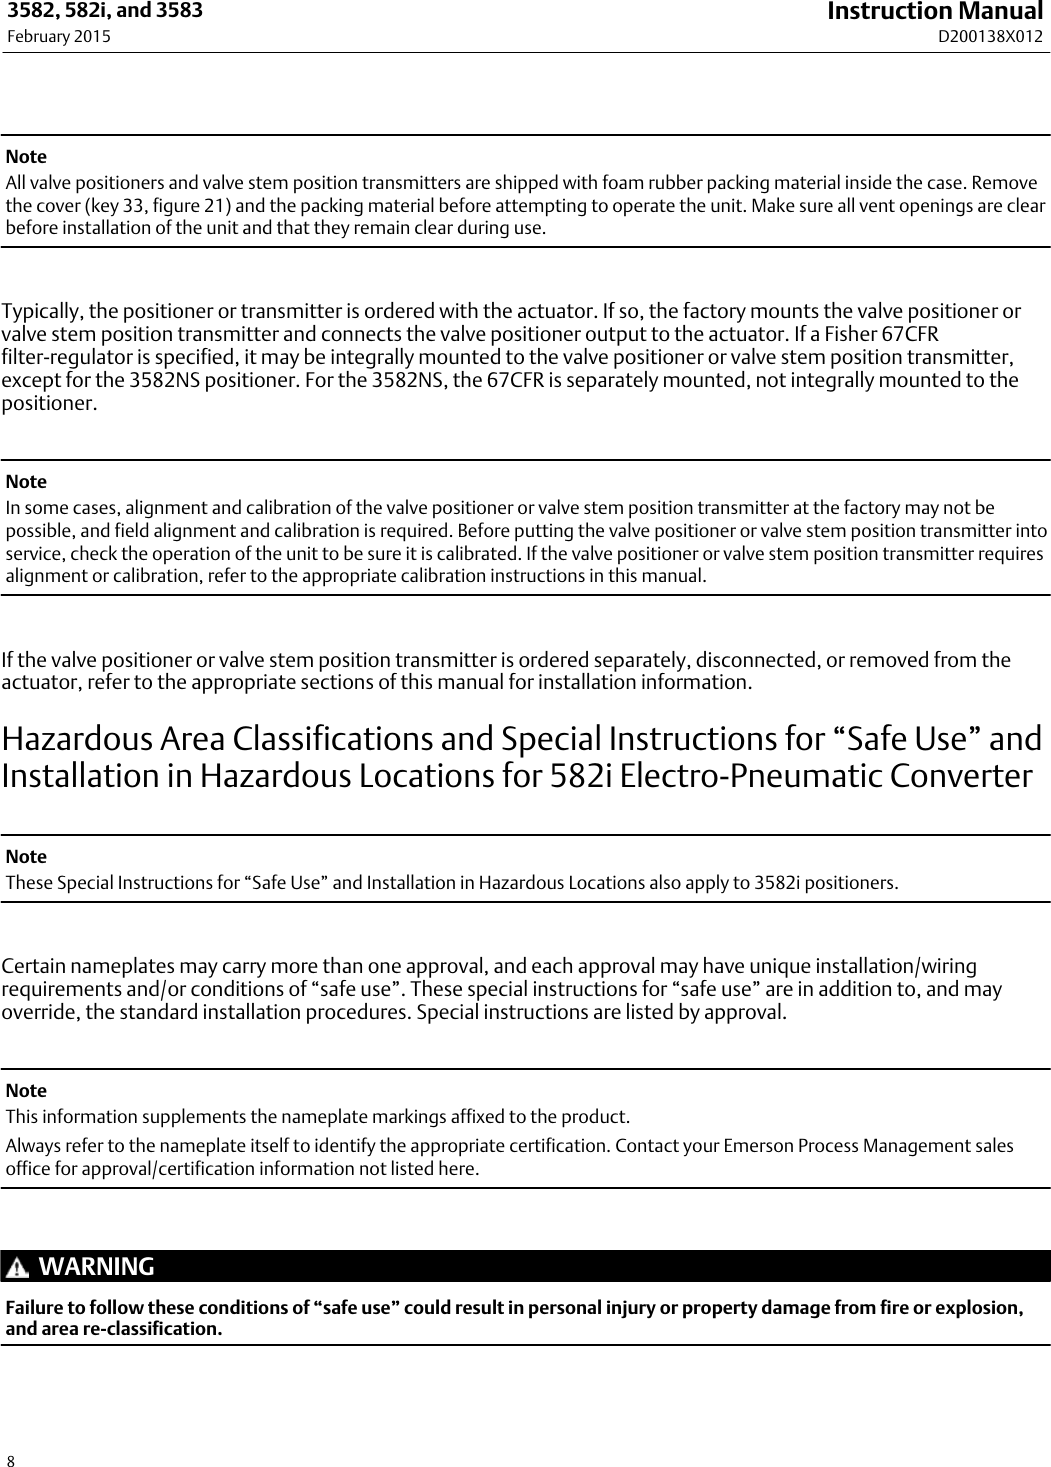 Emerson Fisher 3582 Instruction Manual D200138X012_Feb15_AQ